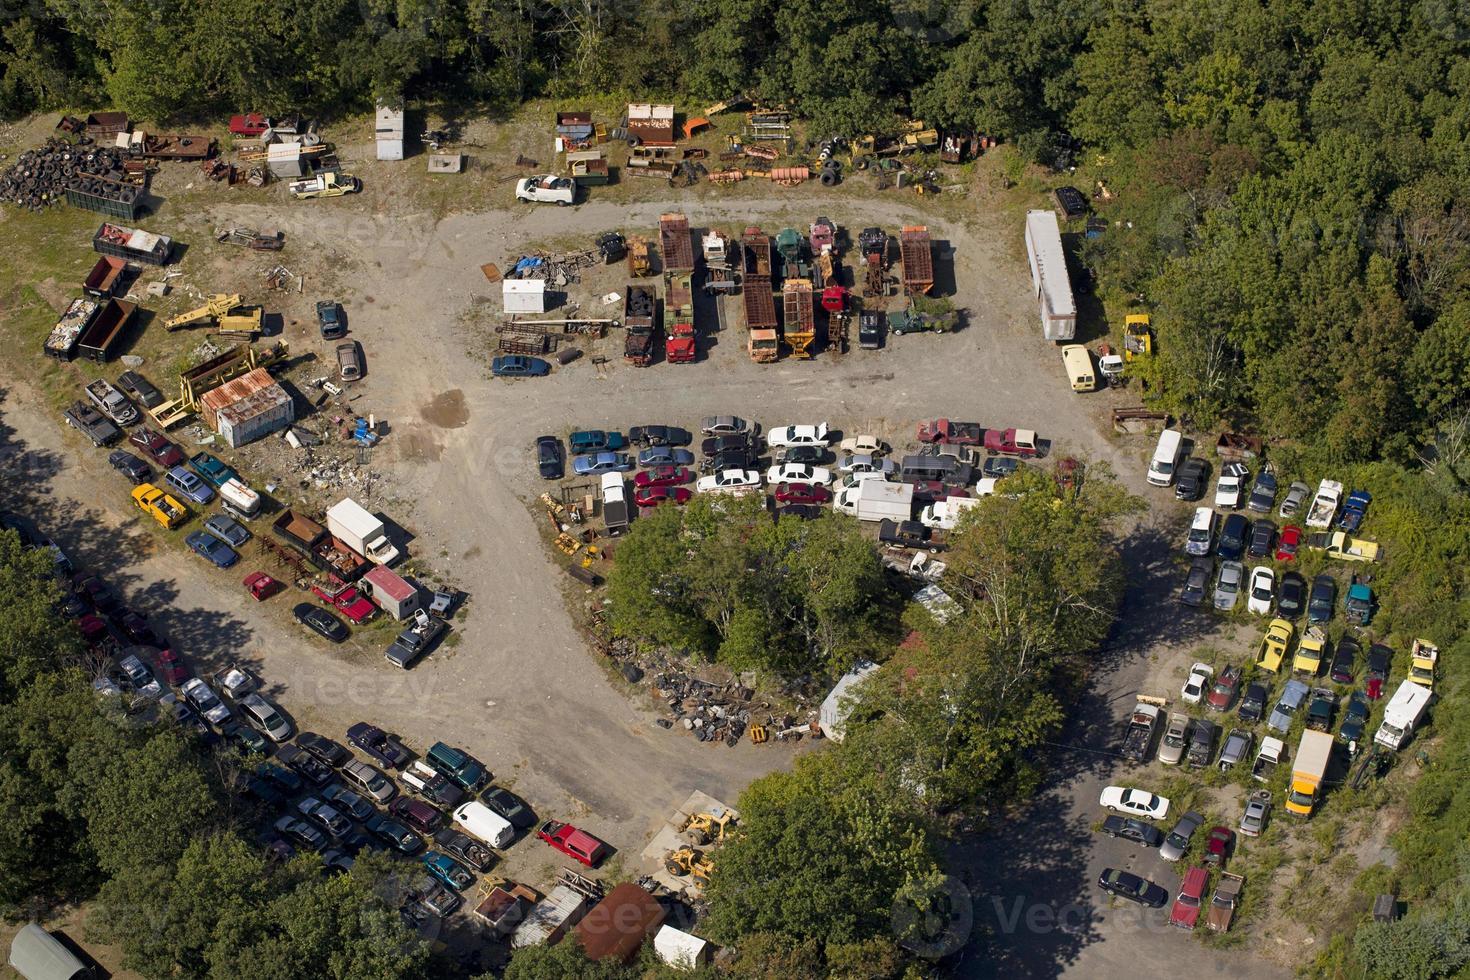 junk yard luchtfoto foto